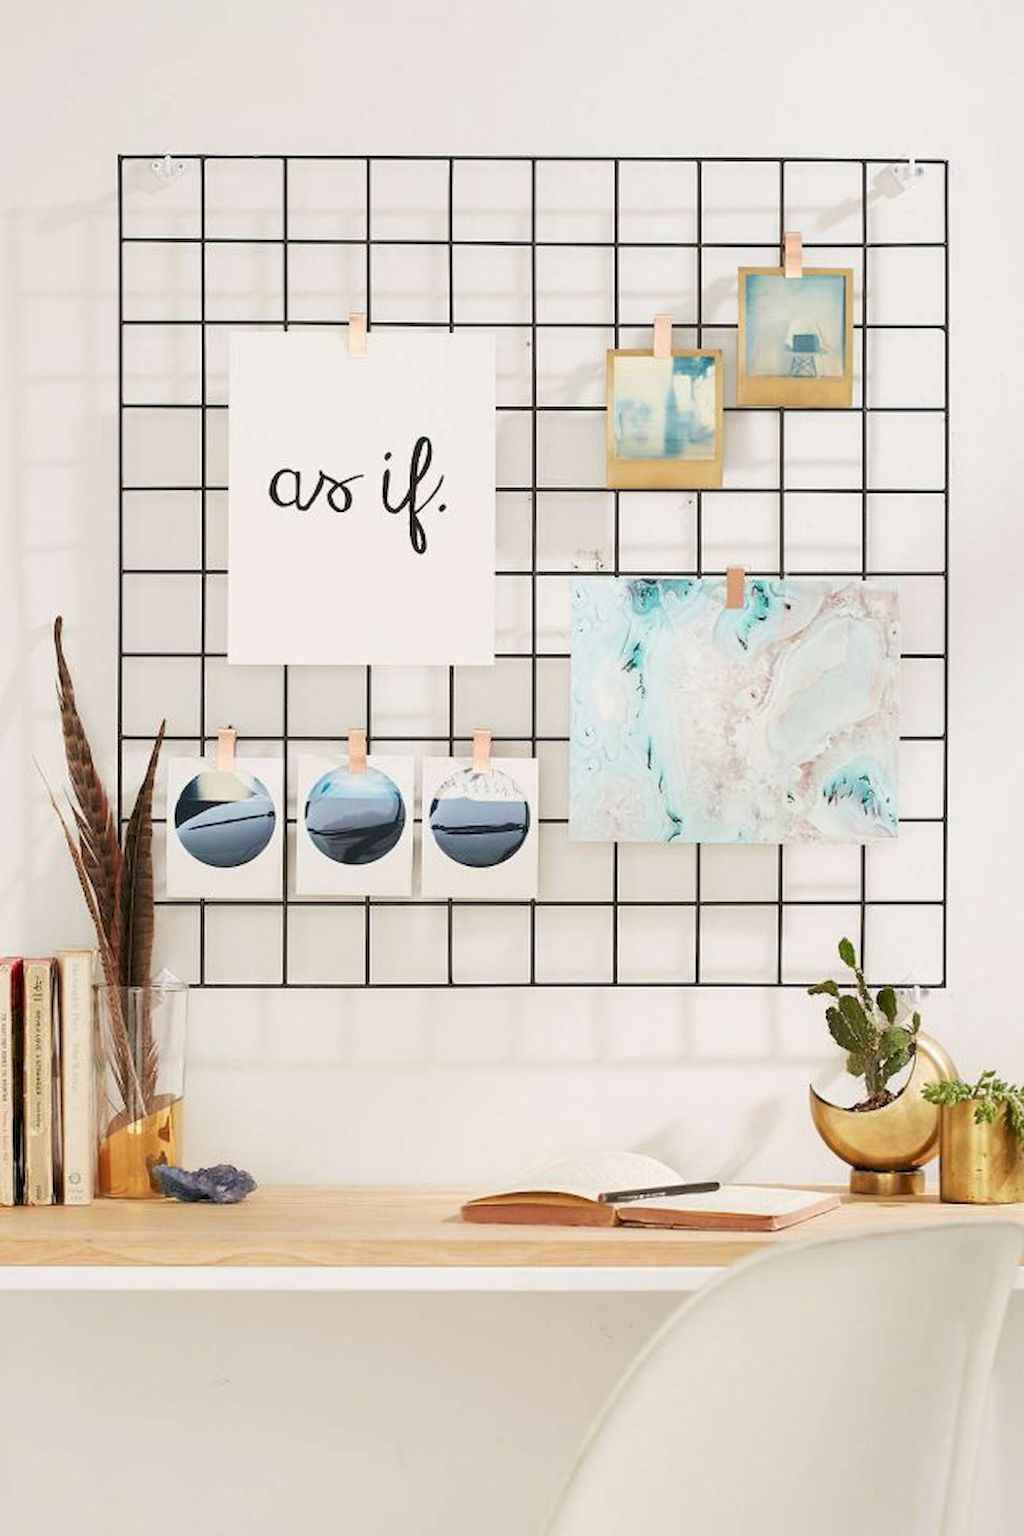 Cute diy dorm room decorating ideas on a budget (12)